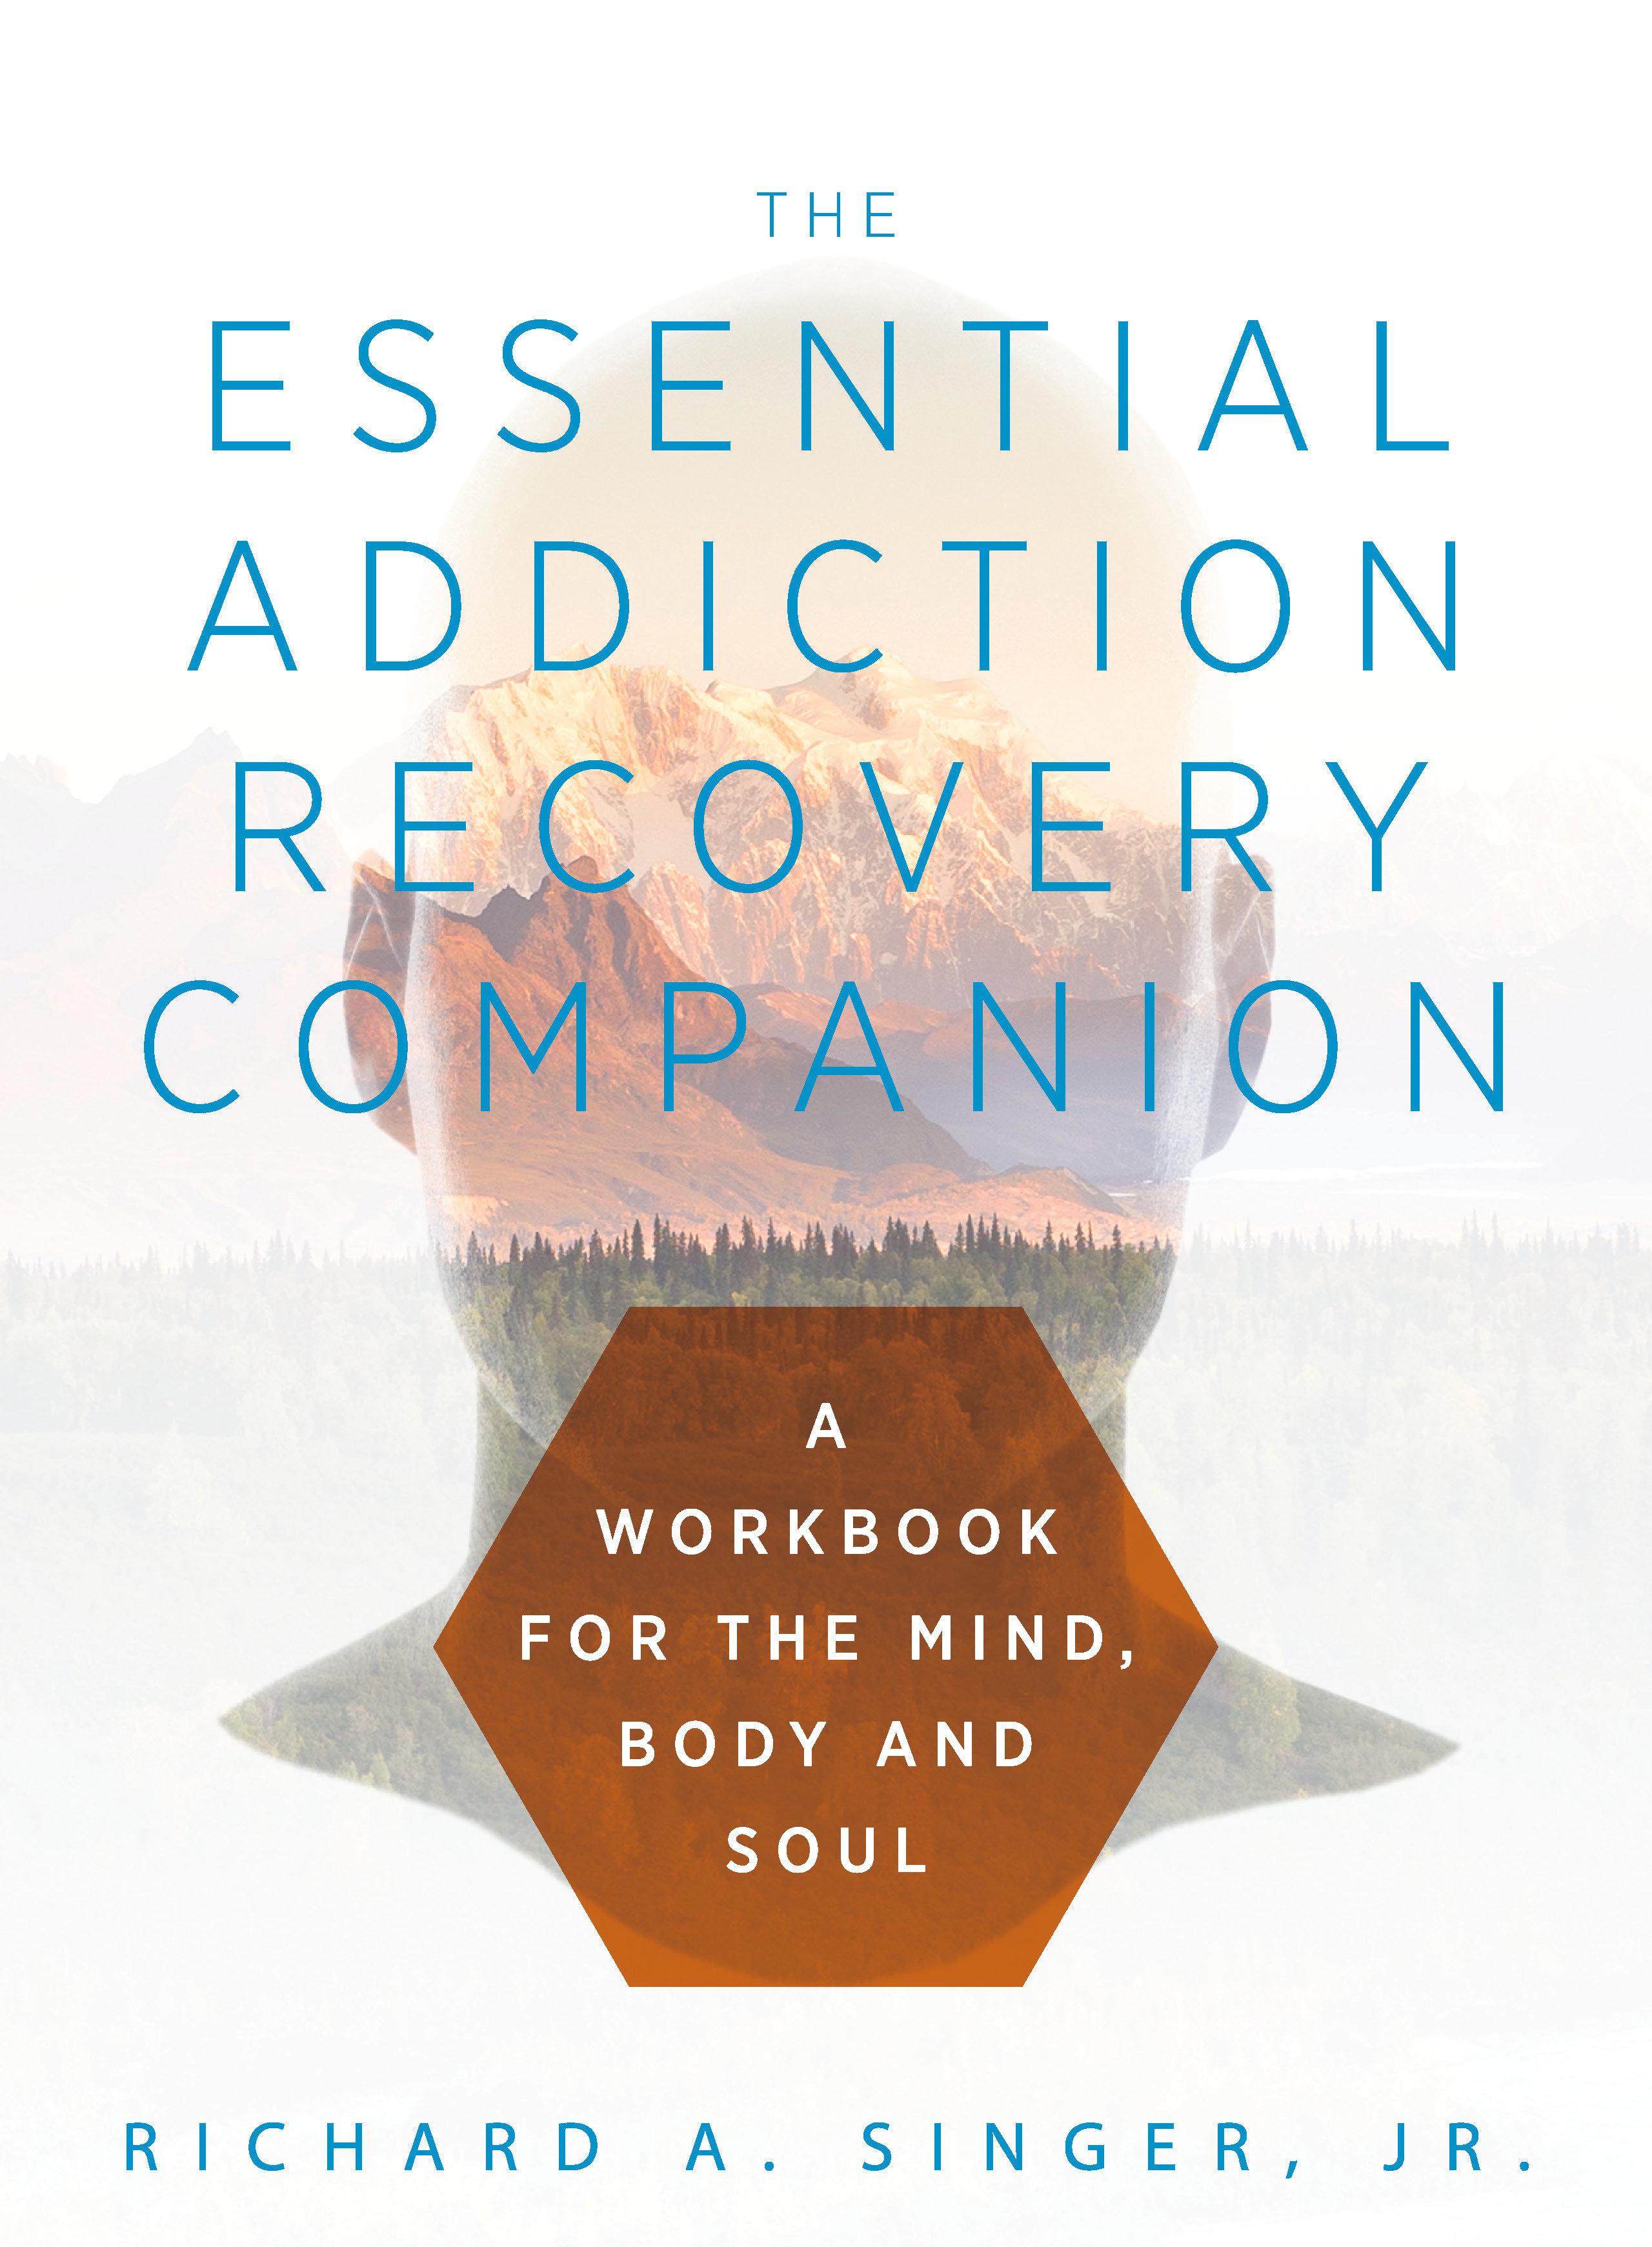 Essential Addiction Recovery Companion 978-1-61599-402-1